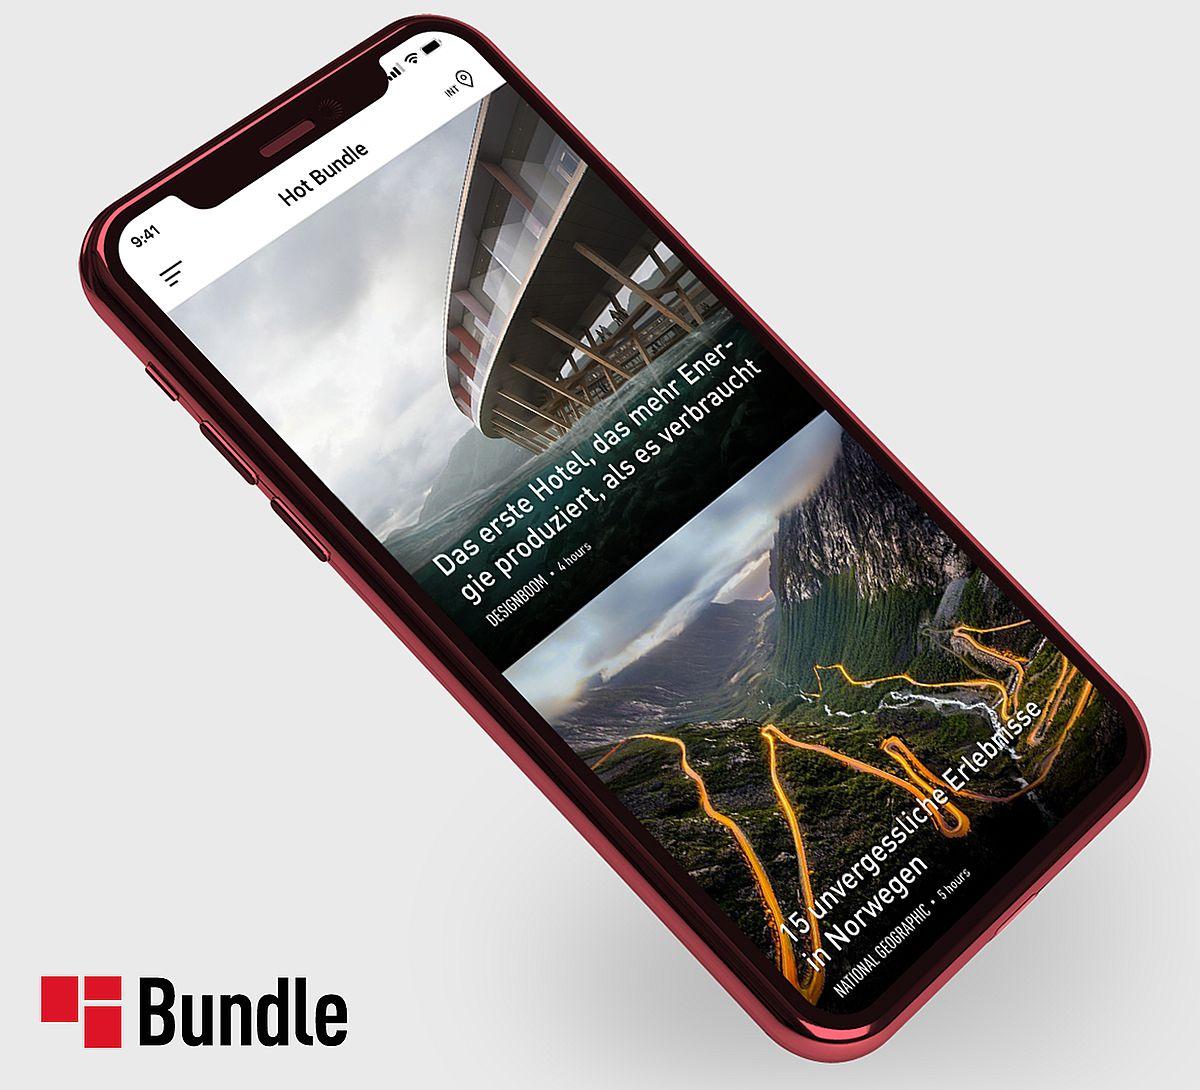 Bundle-App